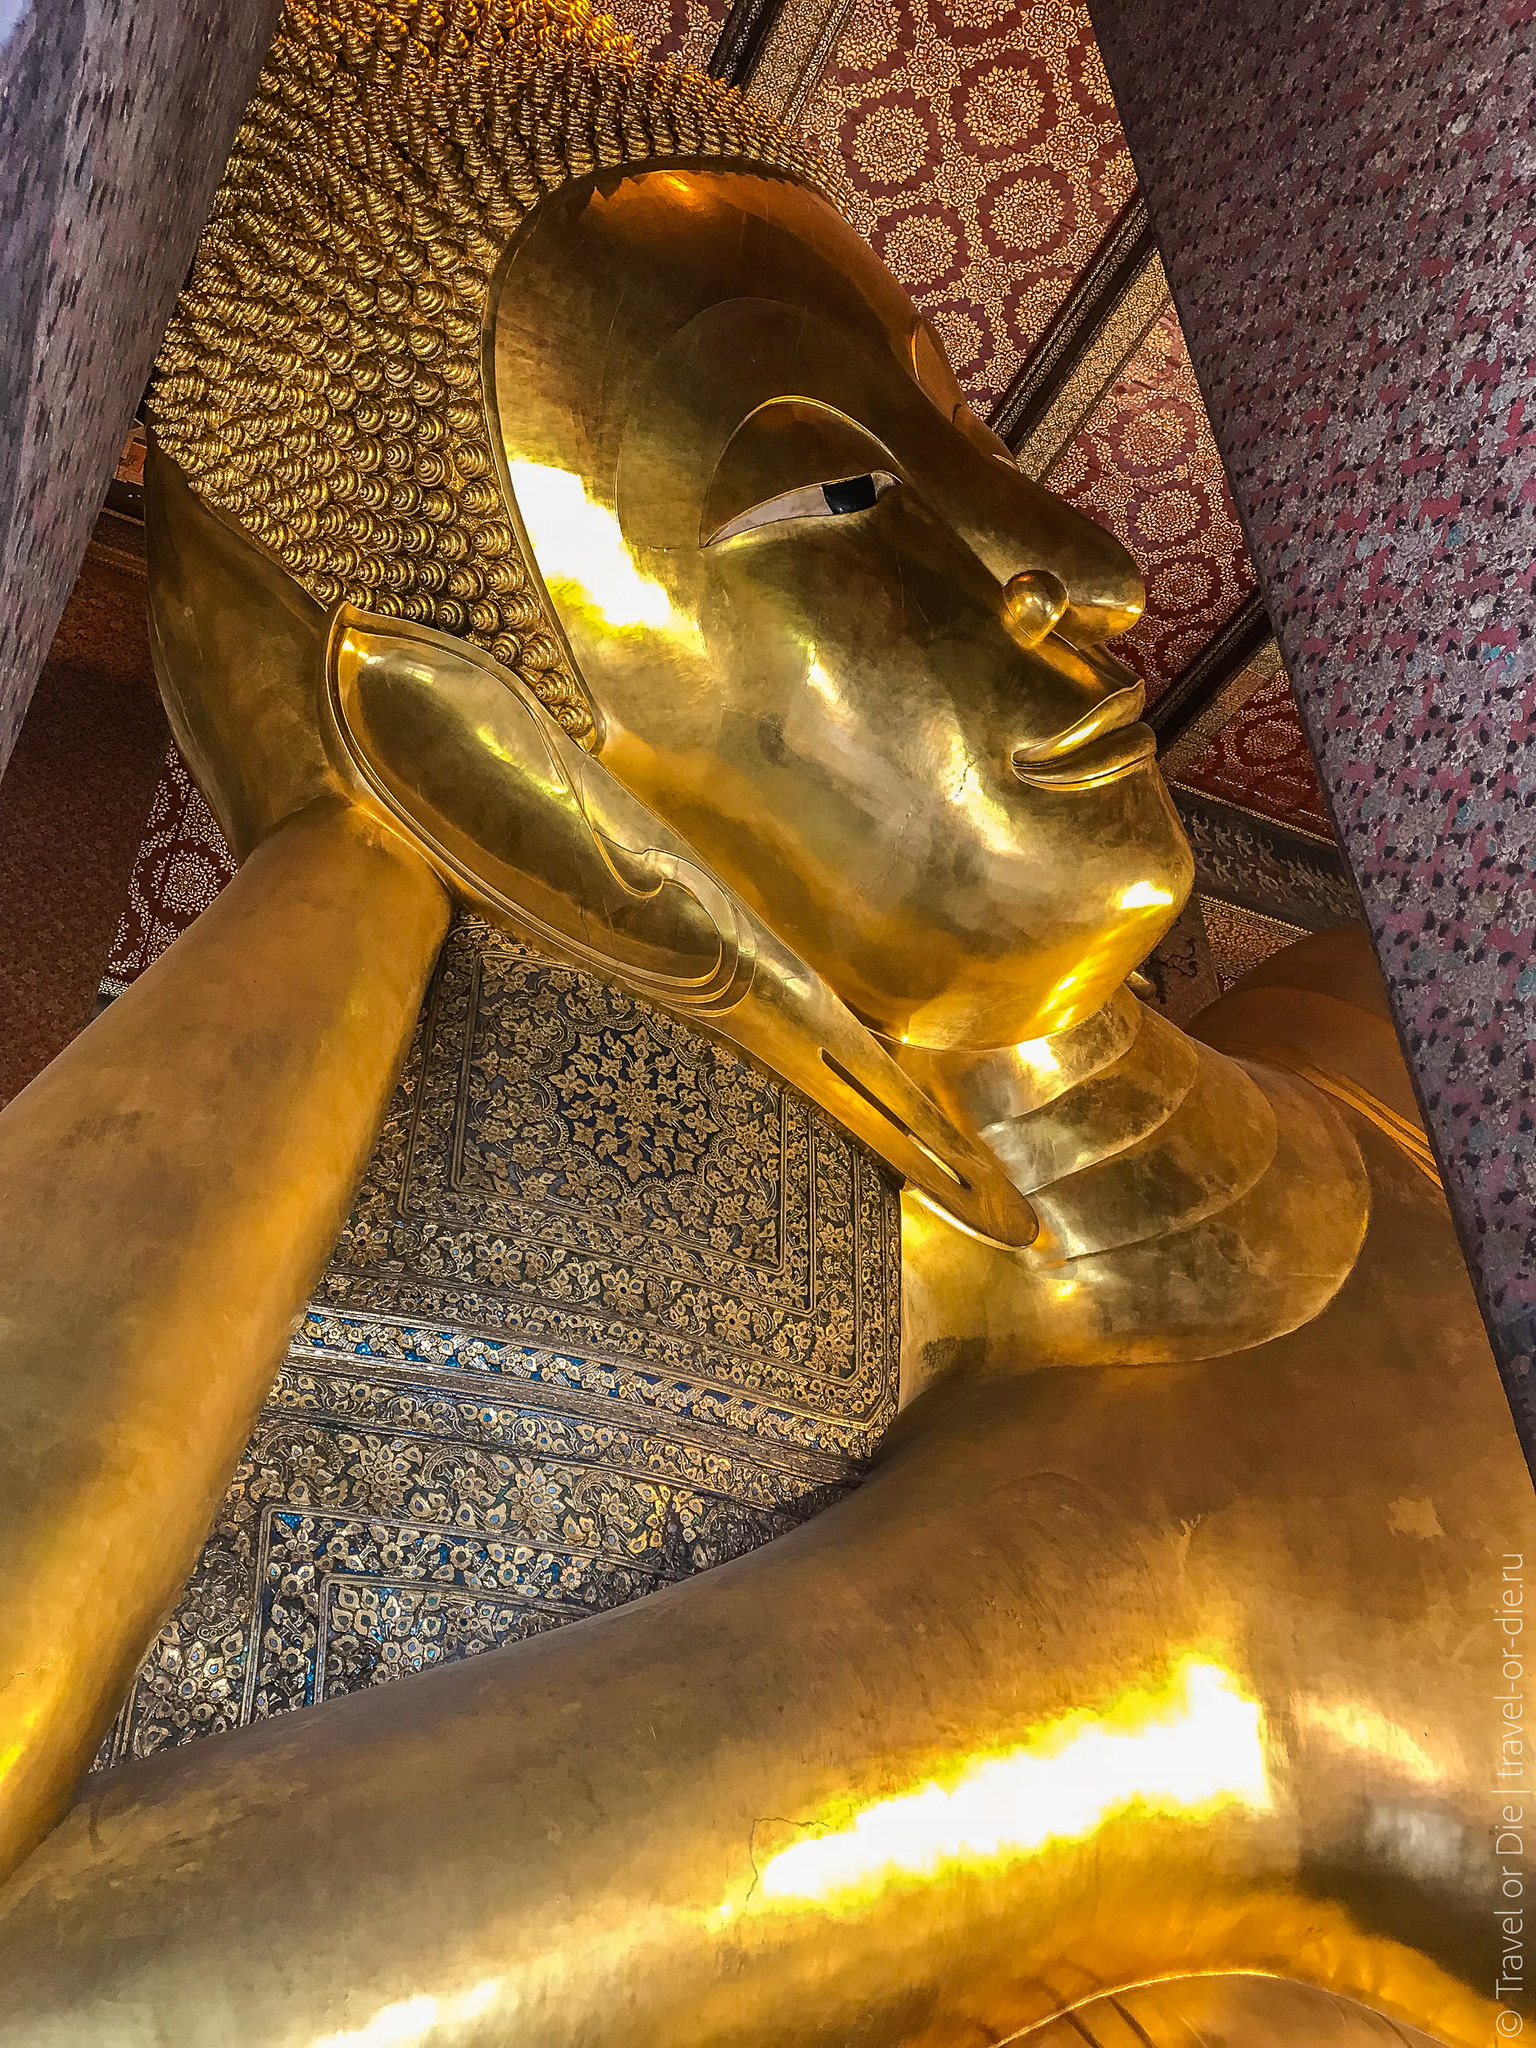 Wat-Pho-Bangkok-Храм-Лежащего-Будды-9127